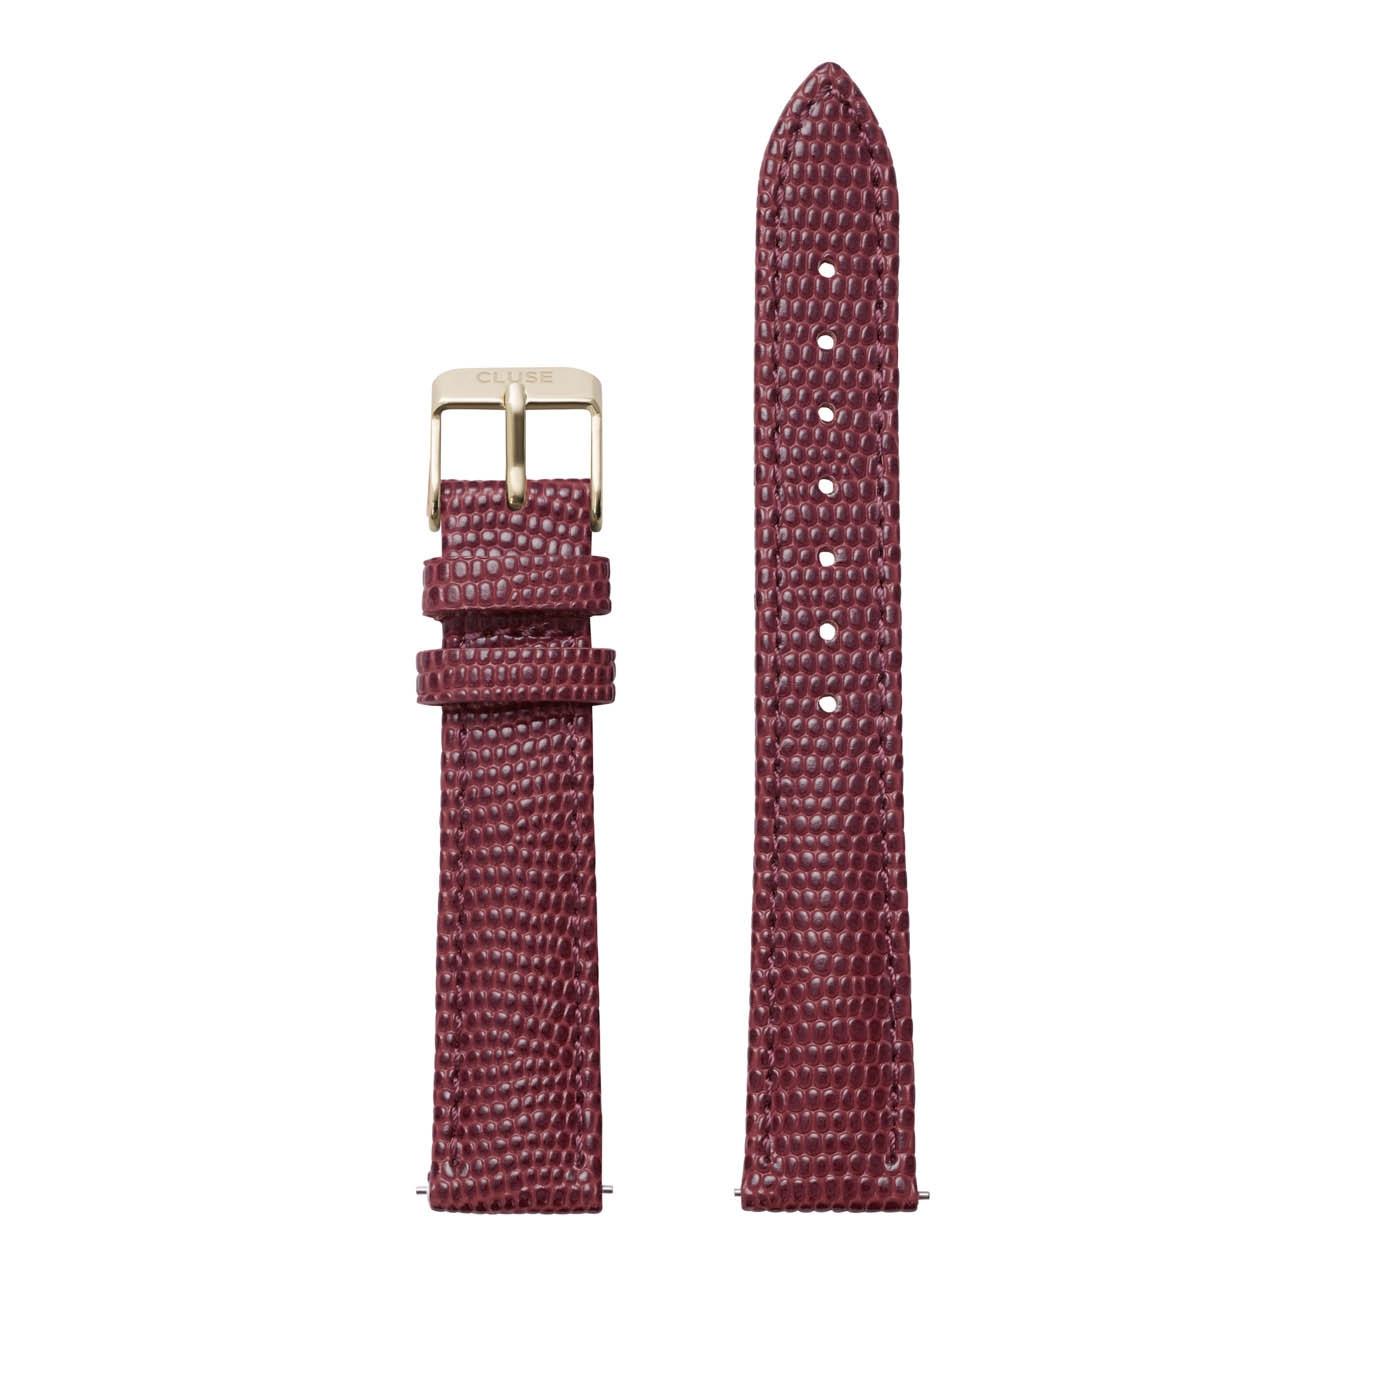 CLUSE Strap 16 mm Minuit Burgundy Lizard CLS379